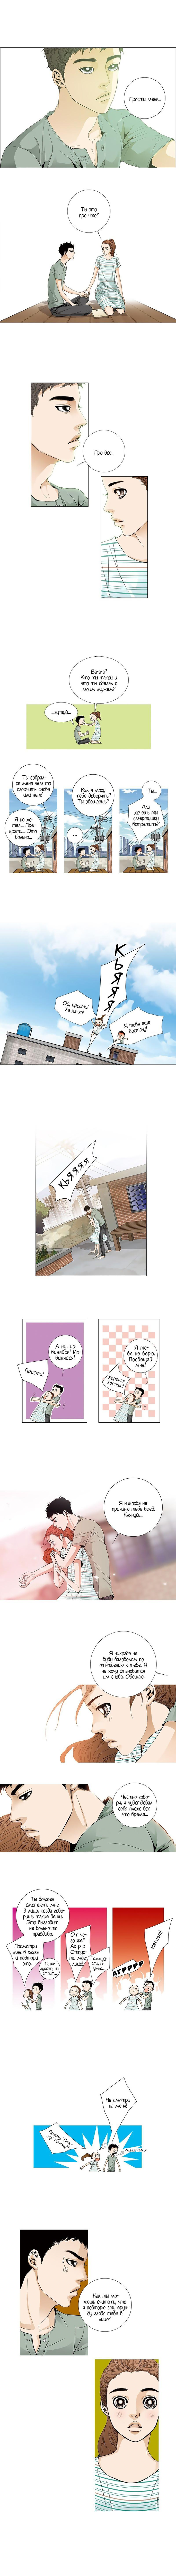 https://r1.ninemanga.com/comics/pic2/29/28573/344330/1512078545522.jpg Page 5